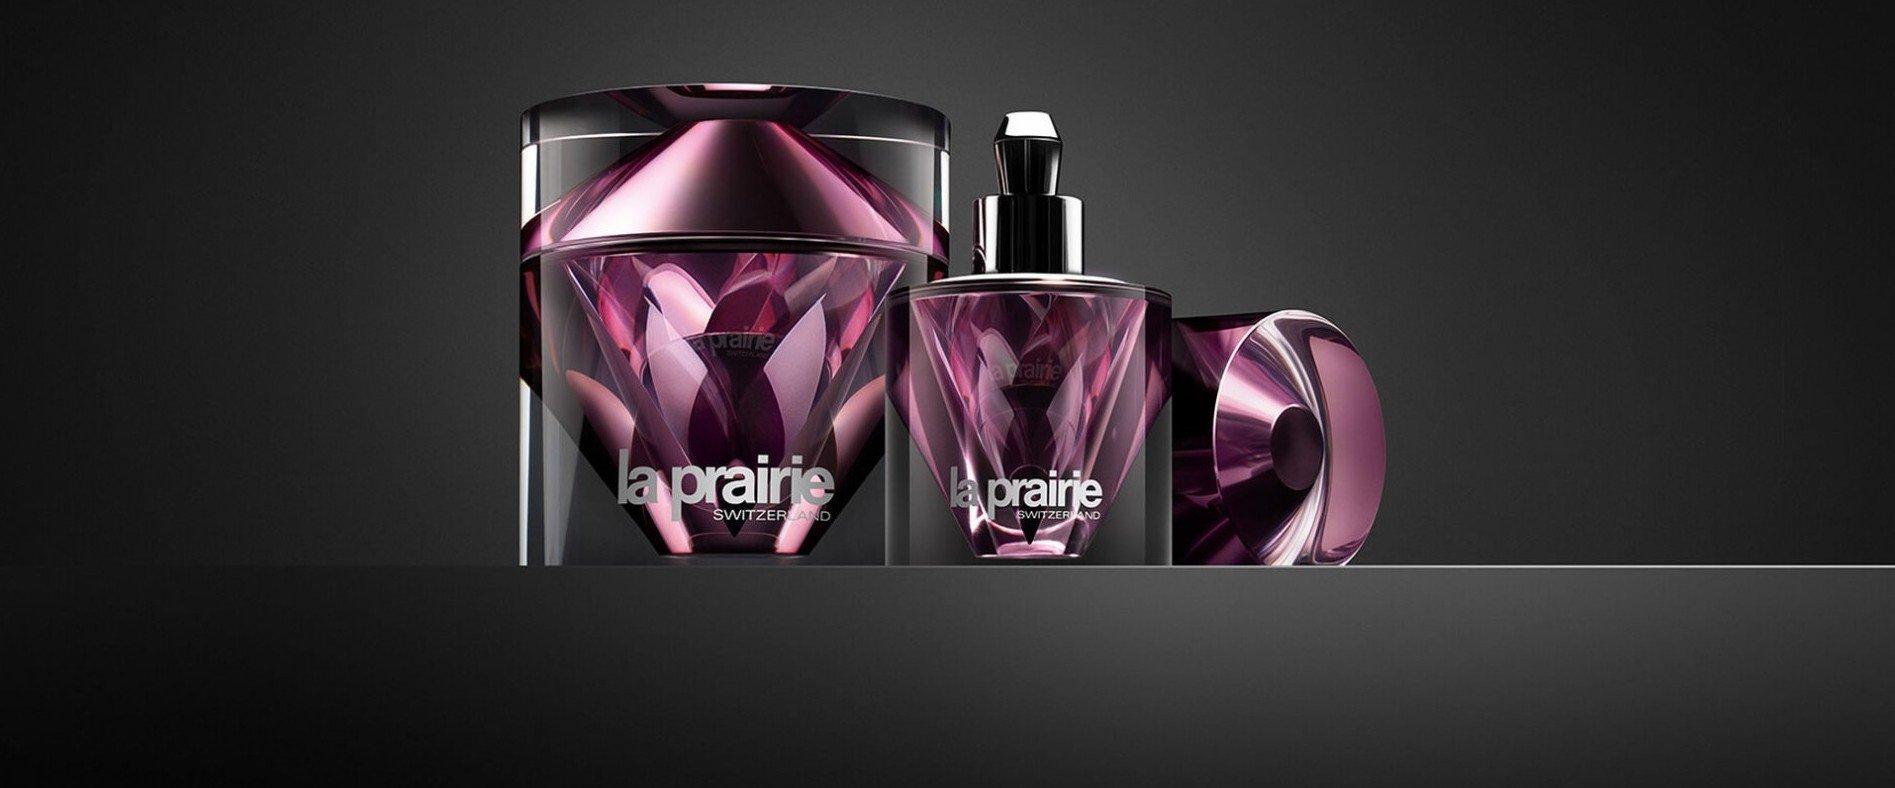 Platinum Rare Cellular Night Elixir de La Prairie, piel joven con solo una gota